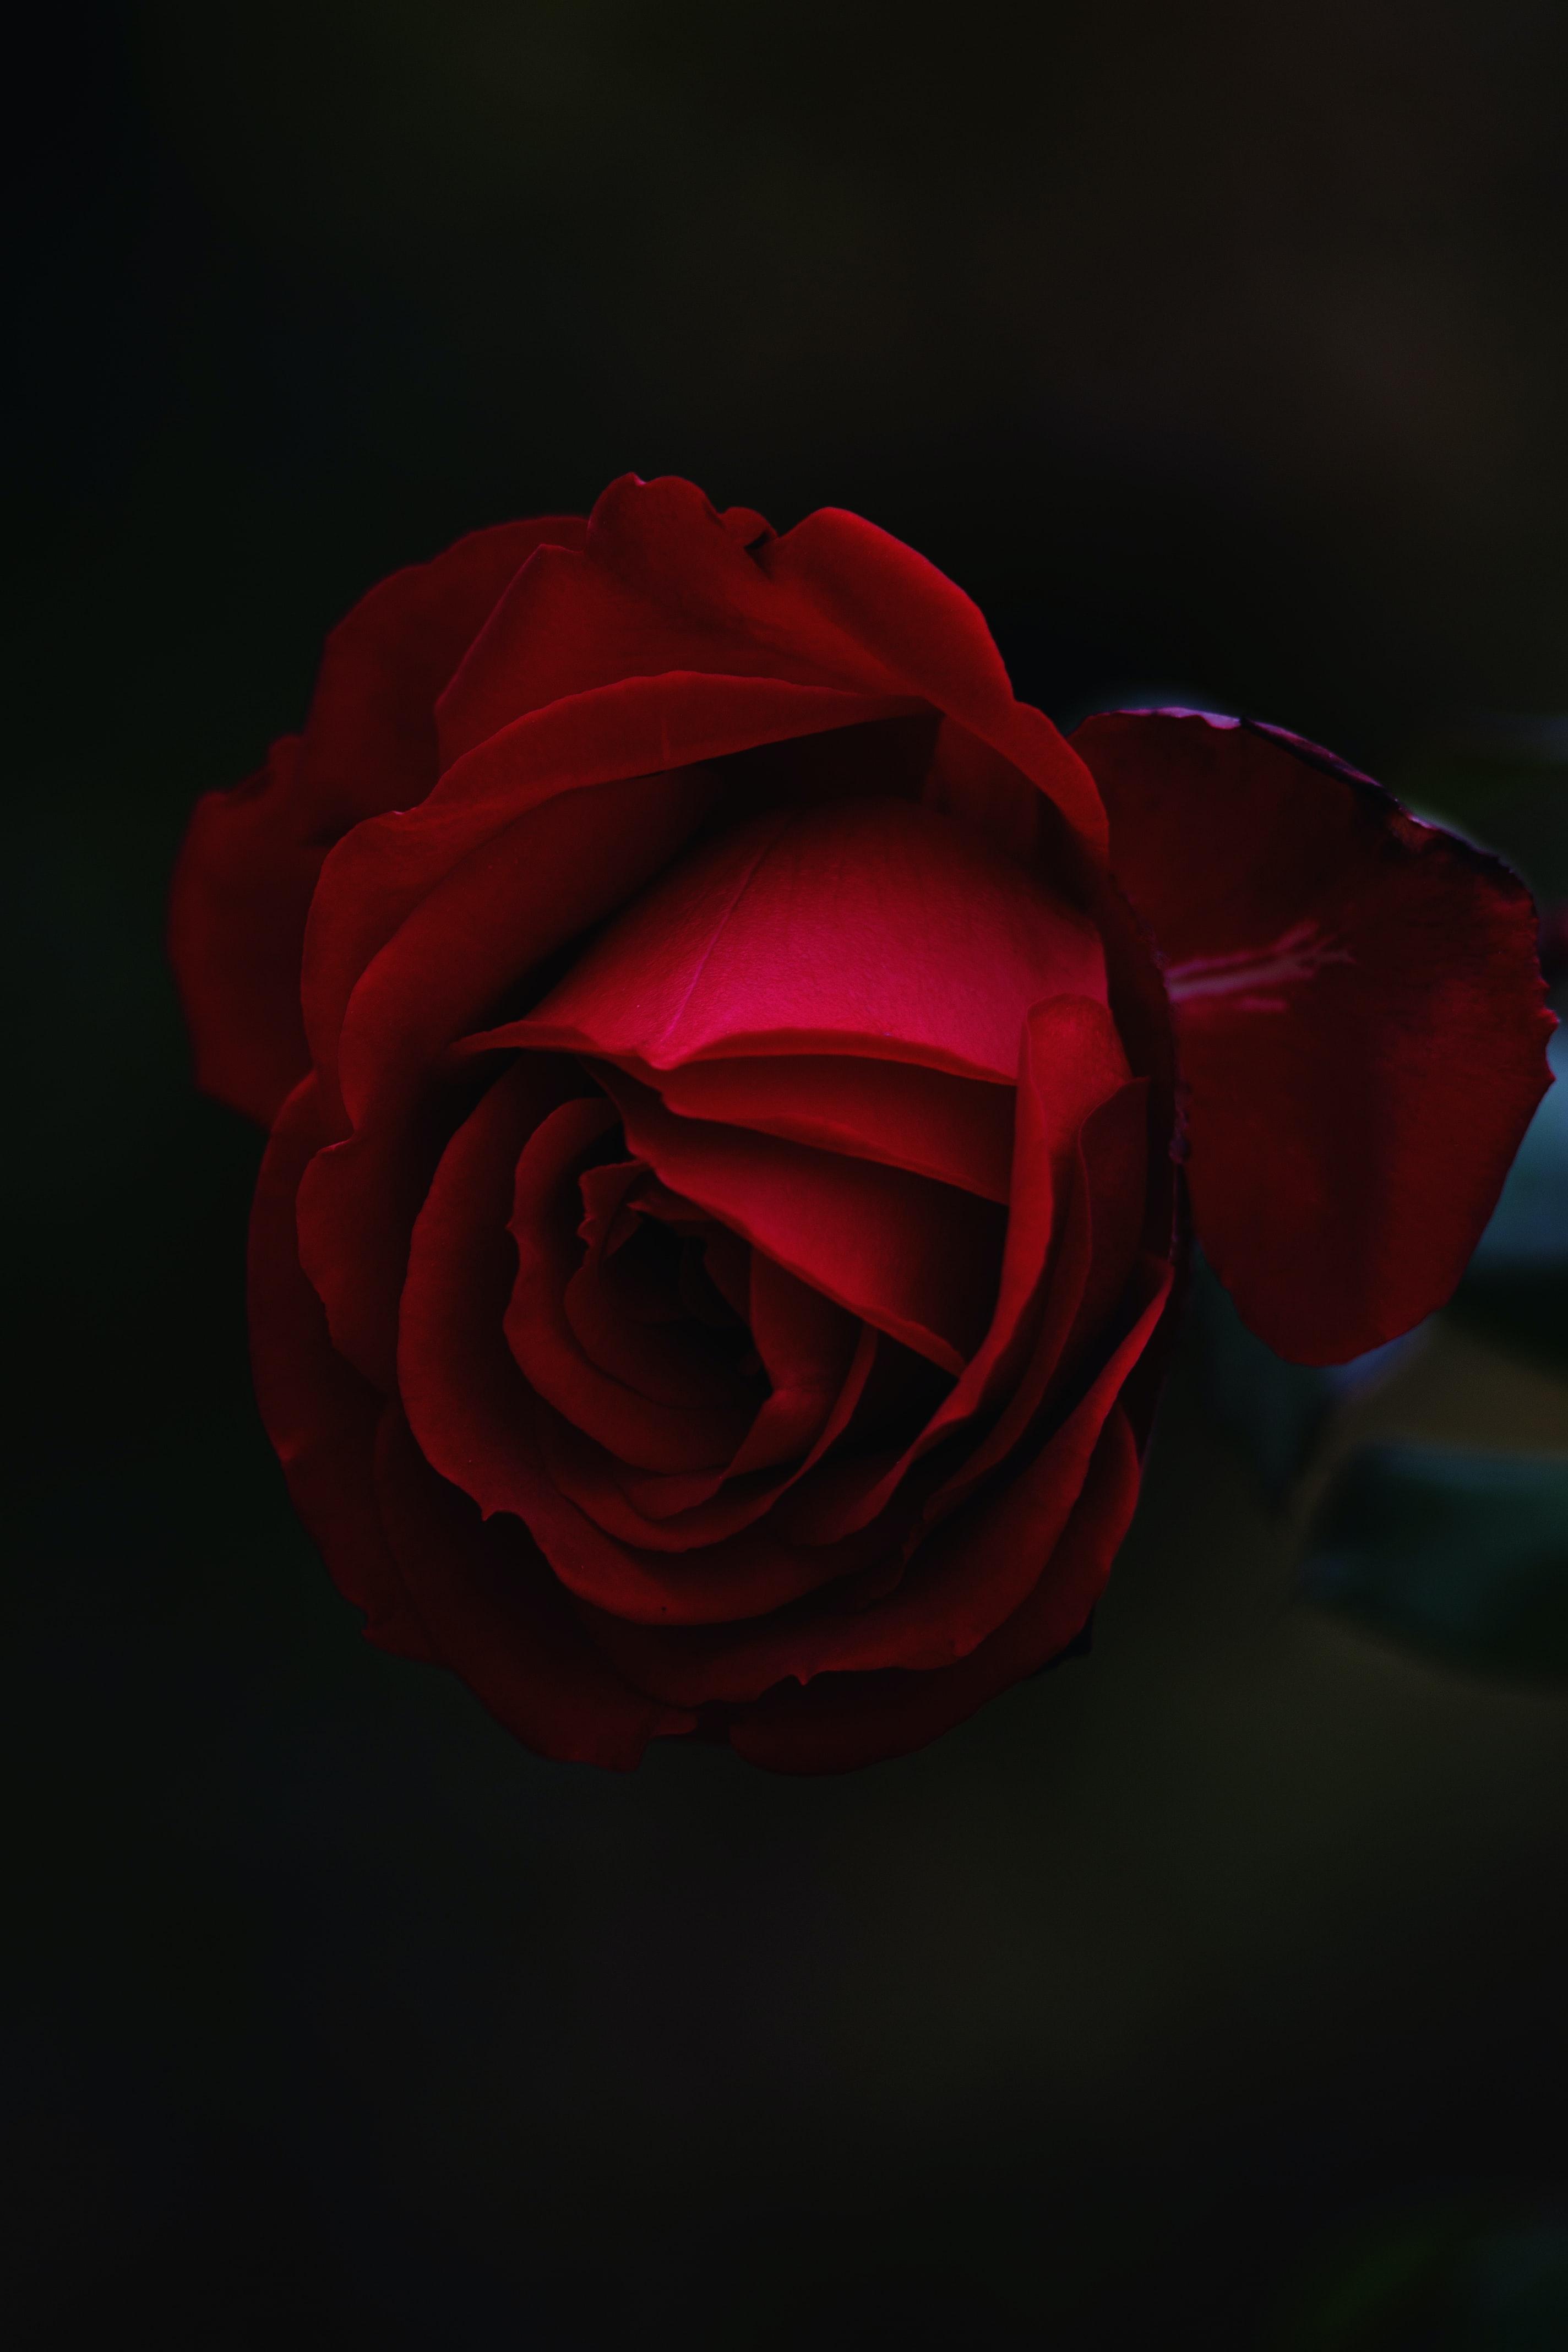 Red Black Rose Pictures Download Free Images On Unsplash